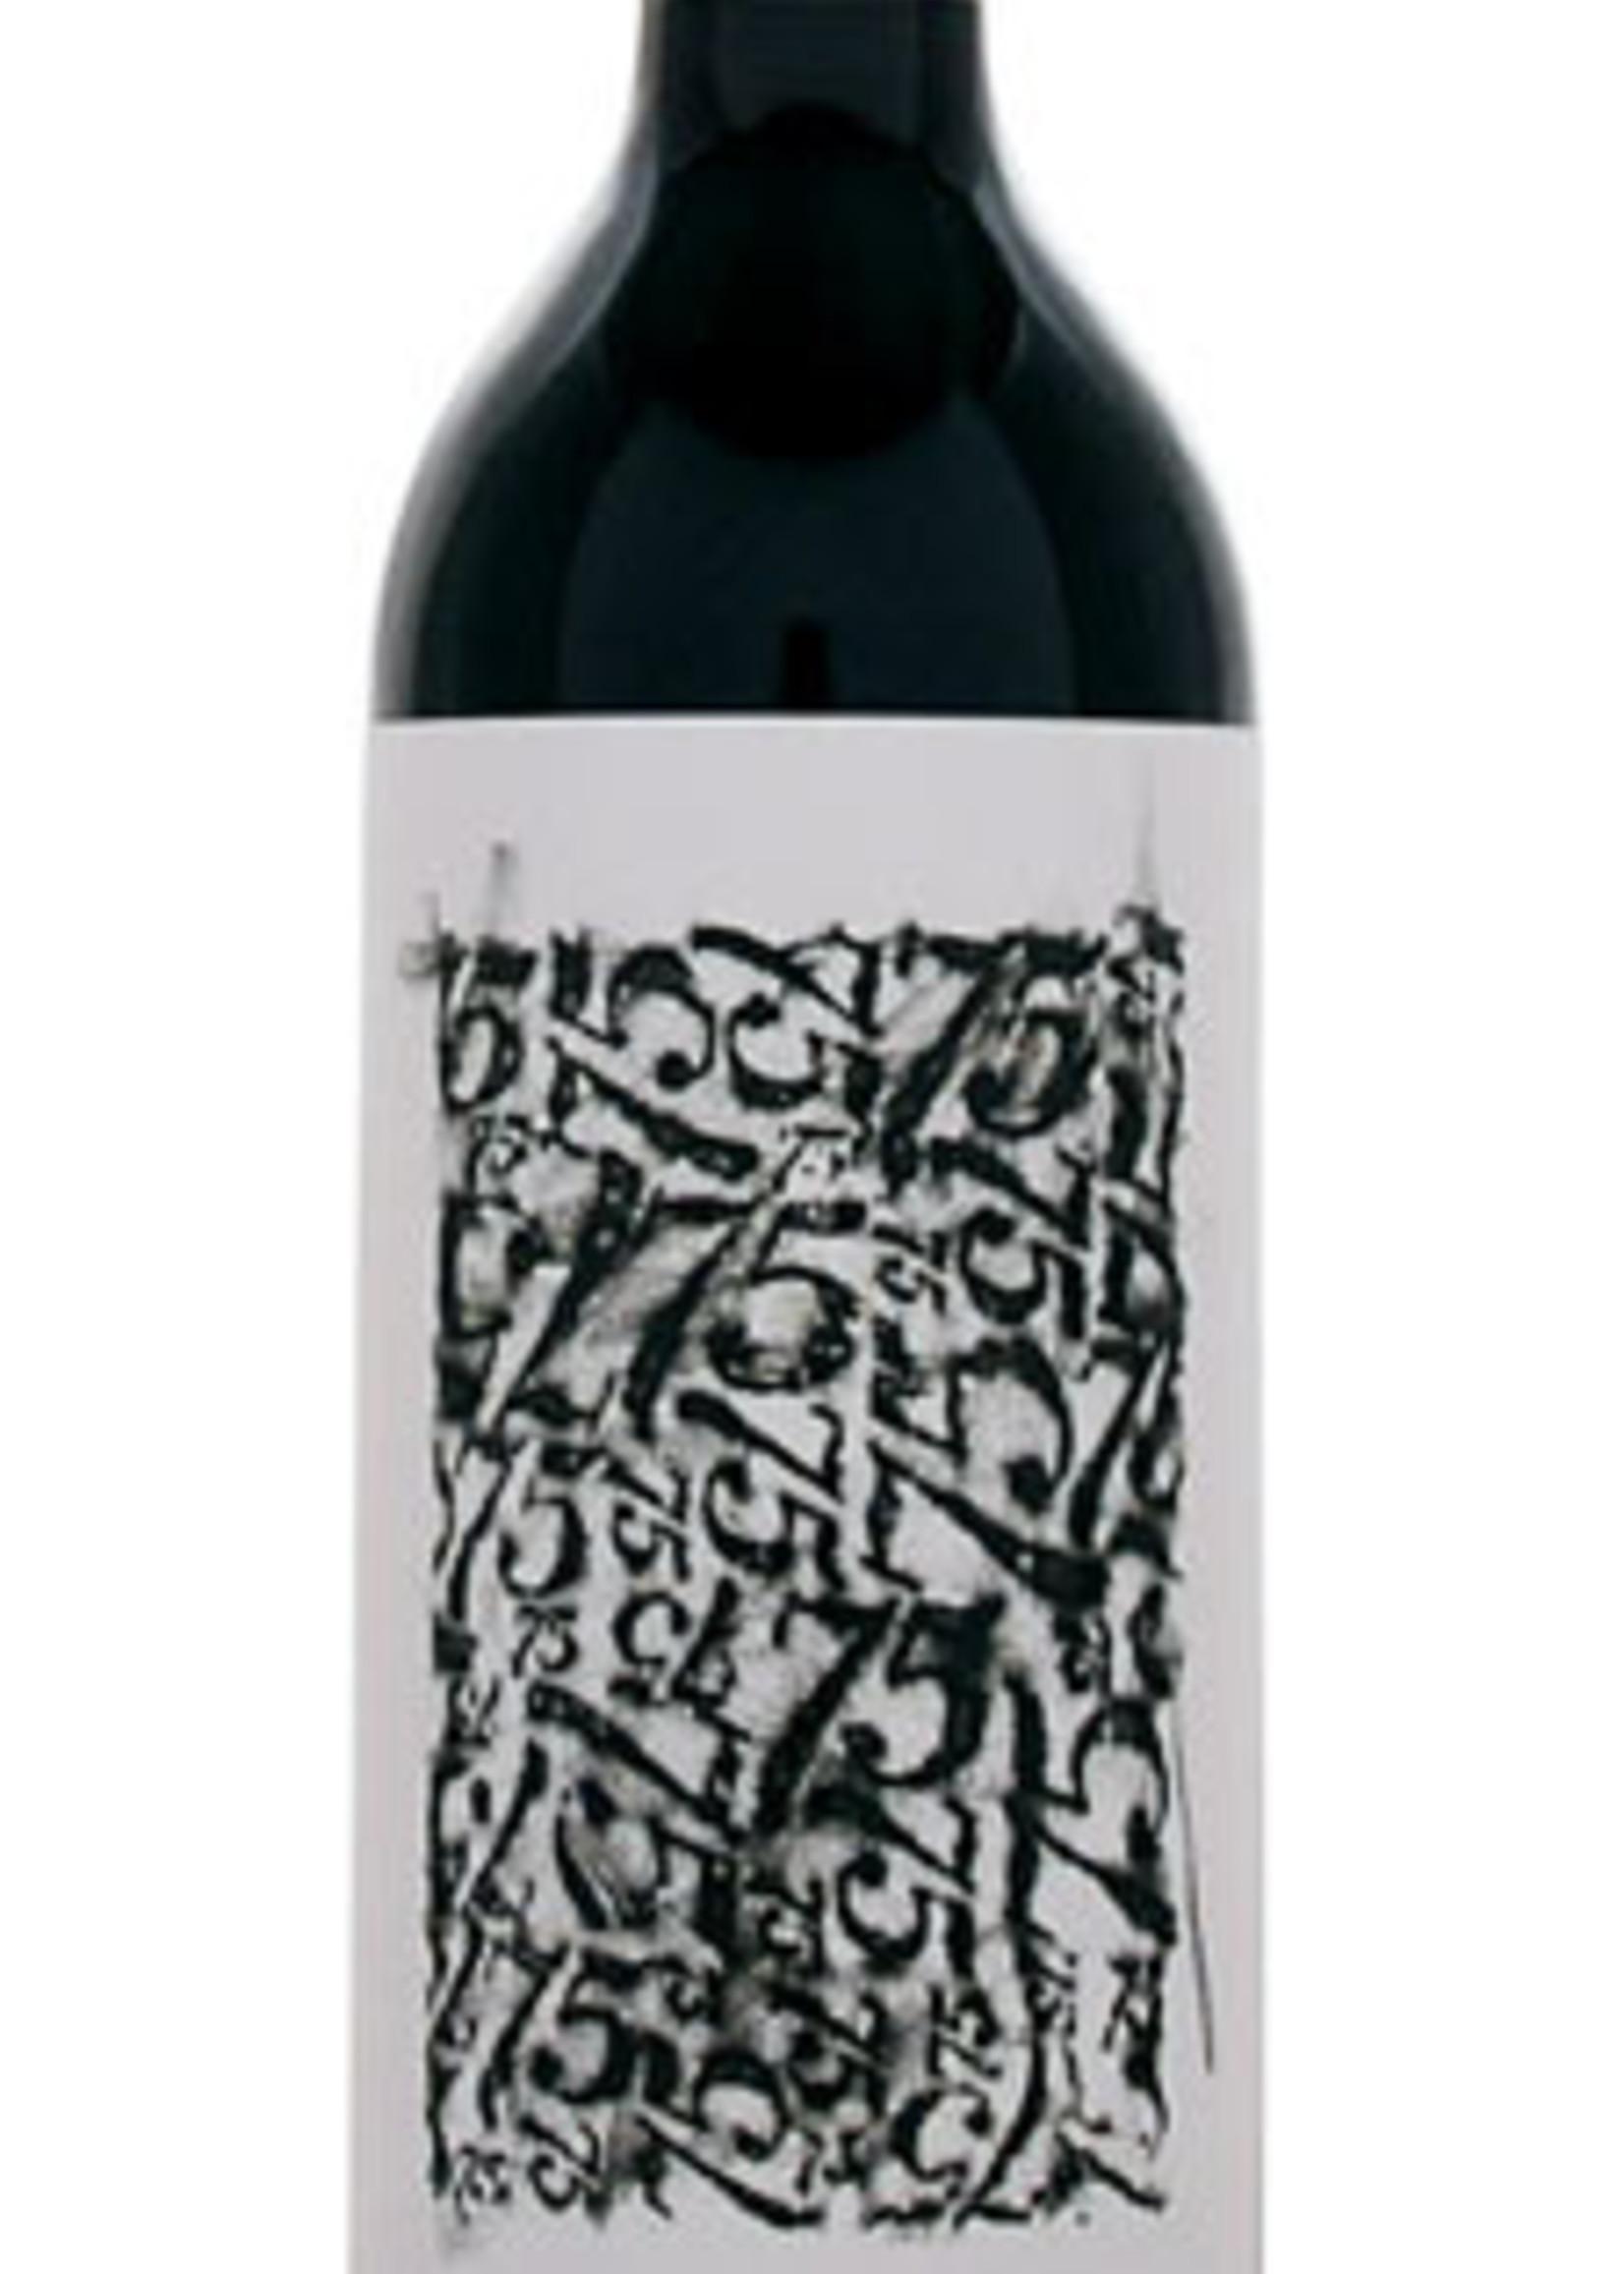 75 Wine Company The Sum